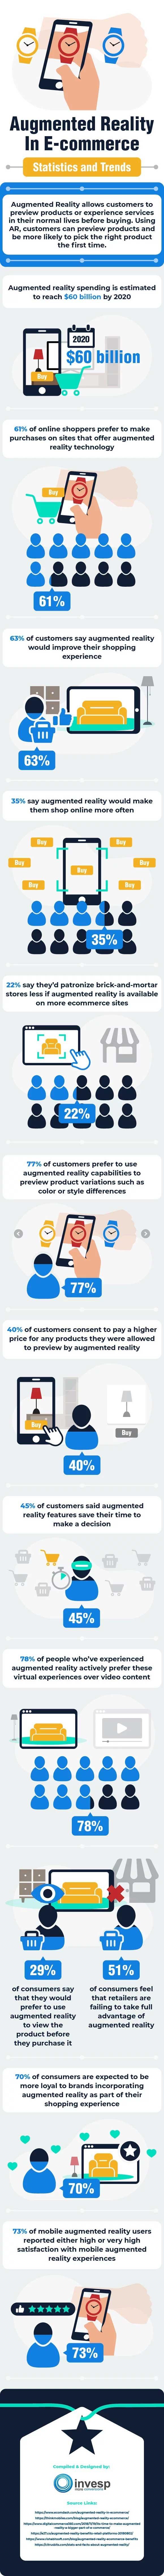 infographie-RA-e-commerce